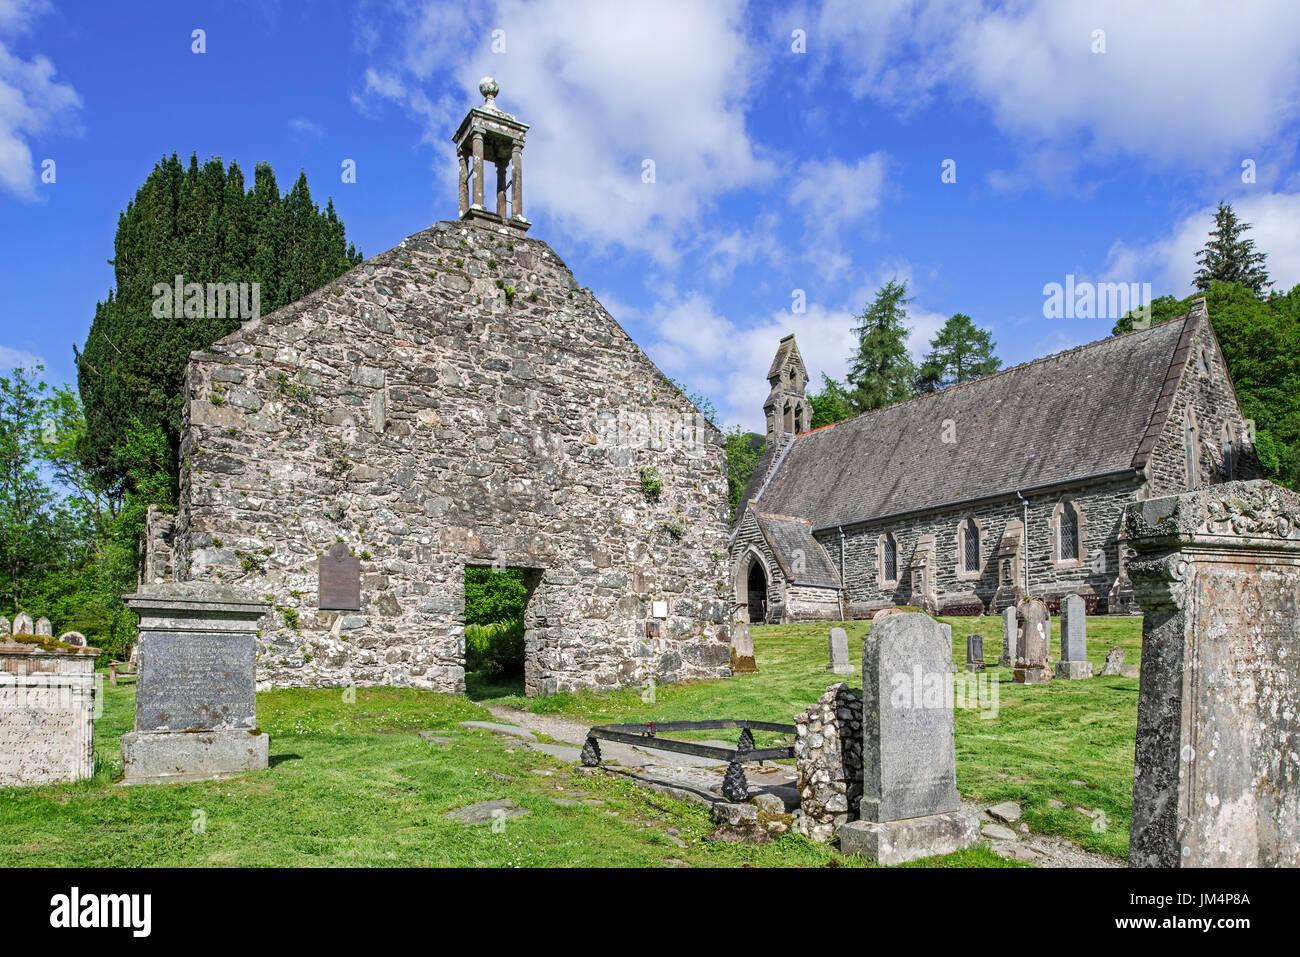 Balquhidder old and new parish church and kirkyard, final resting place of Rob Roy MacGregor, Stirling, Scotland, UK Stock Photo